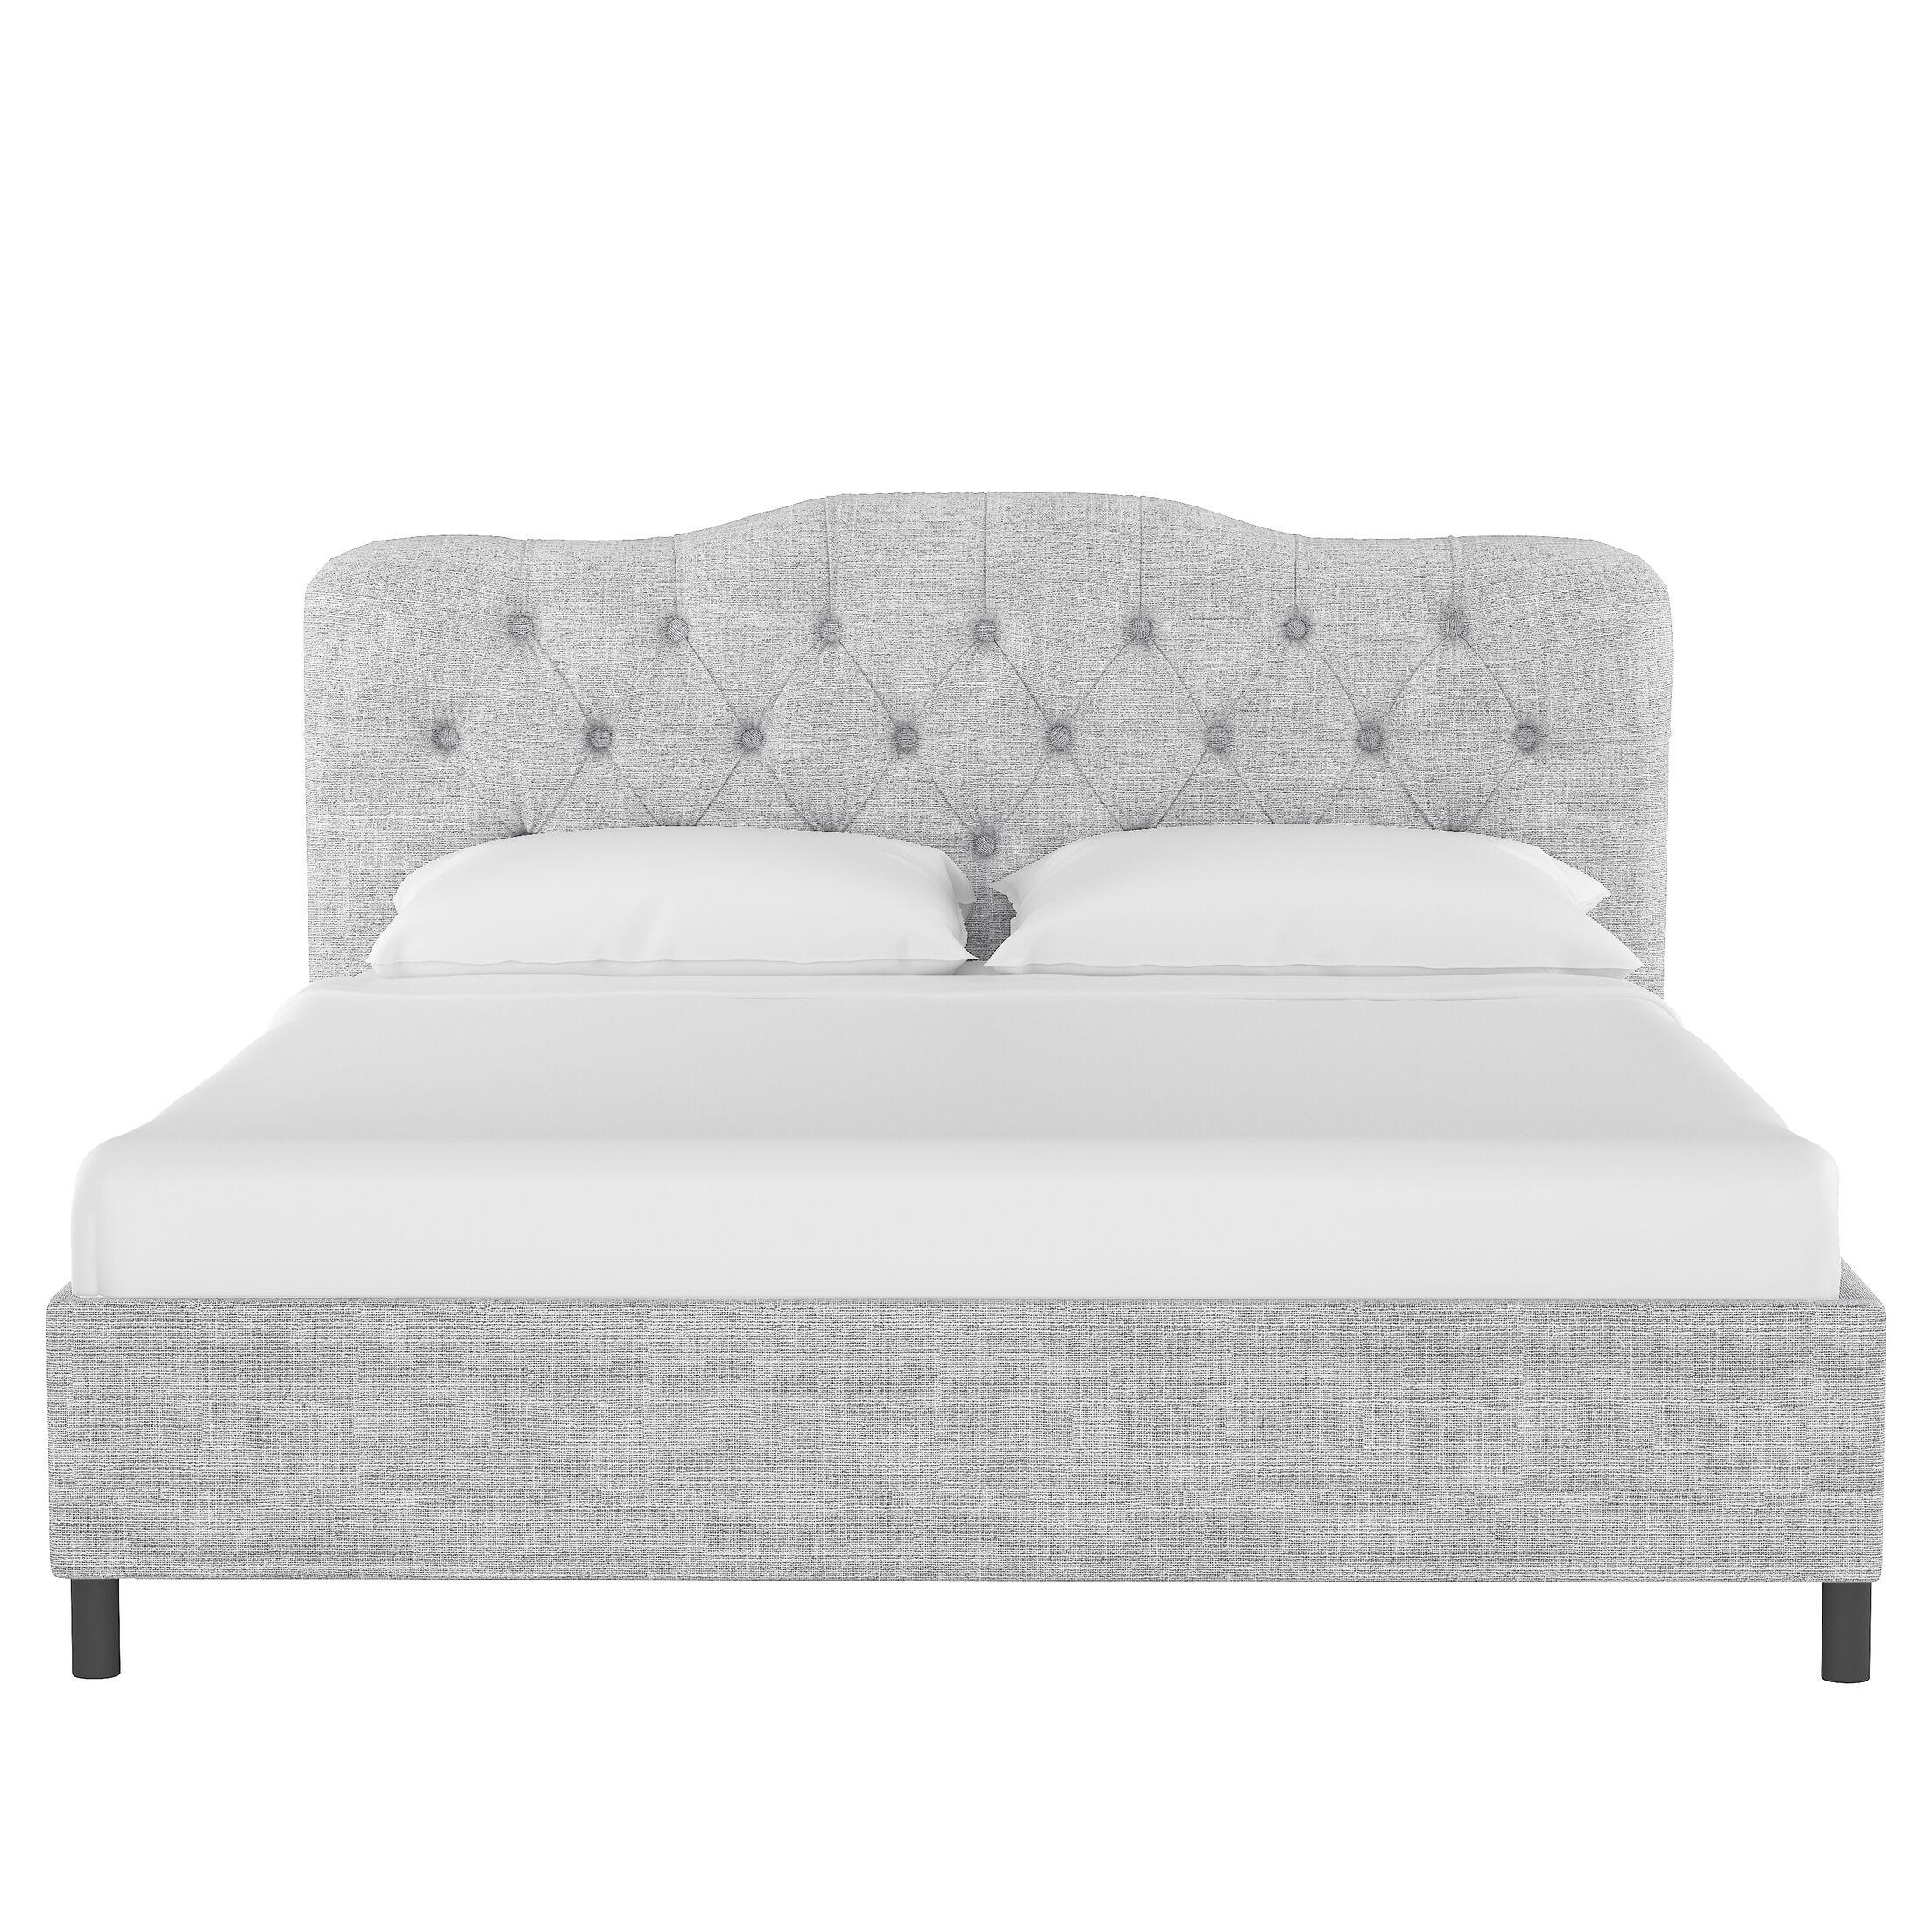 Longview Upholstered Platform Bed Size: Queen, Color: Pumice